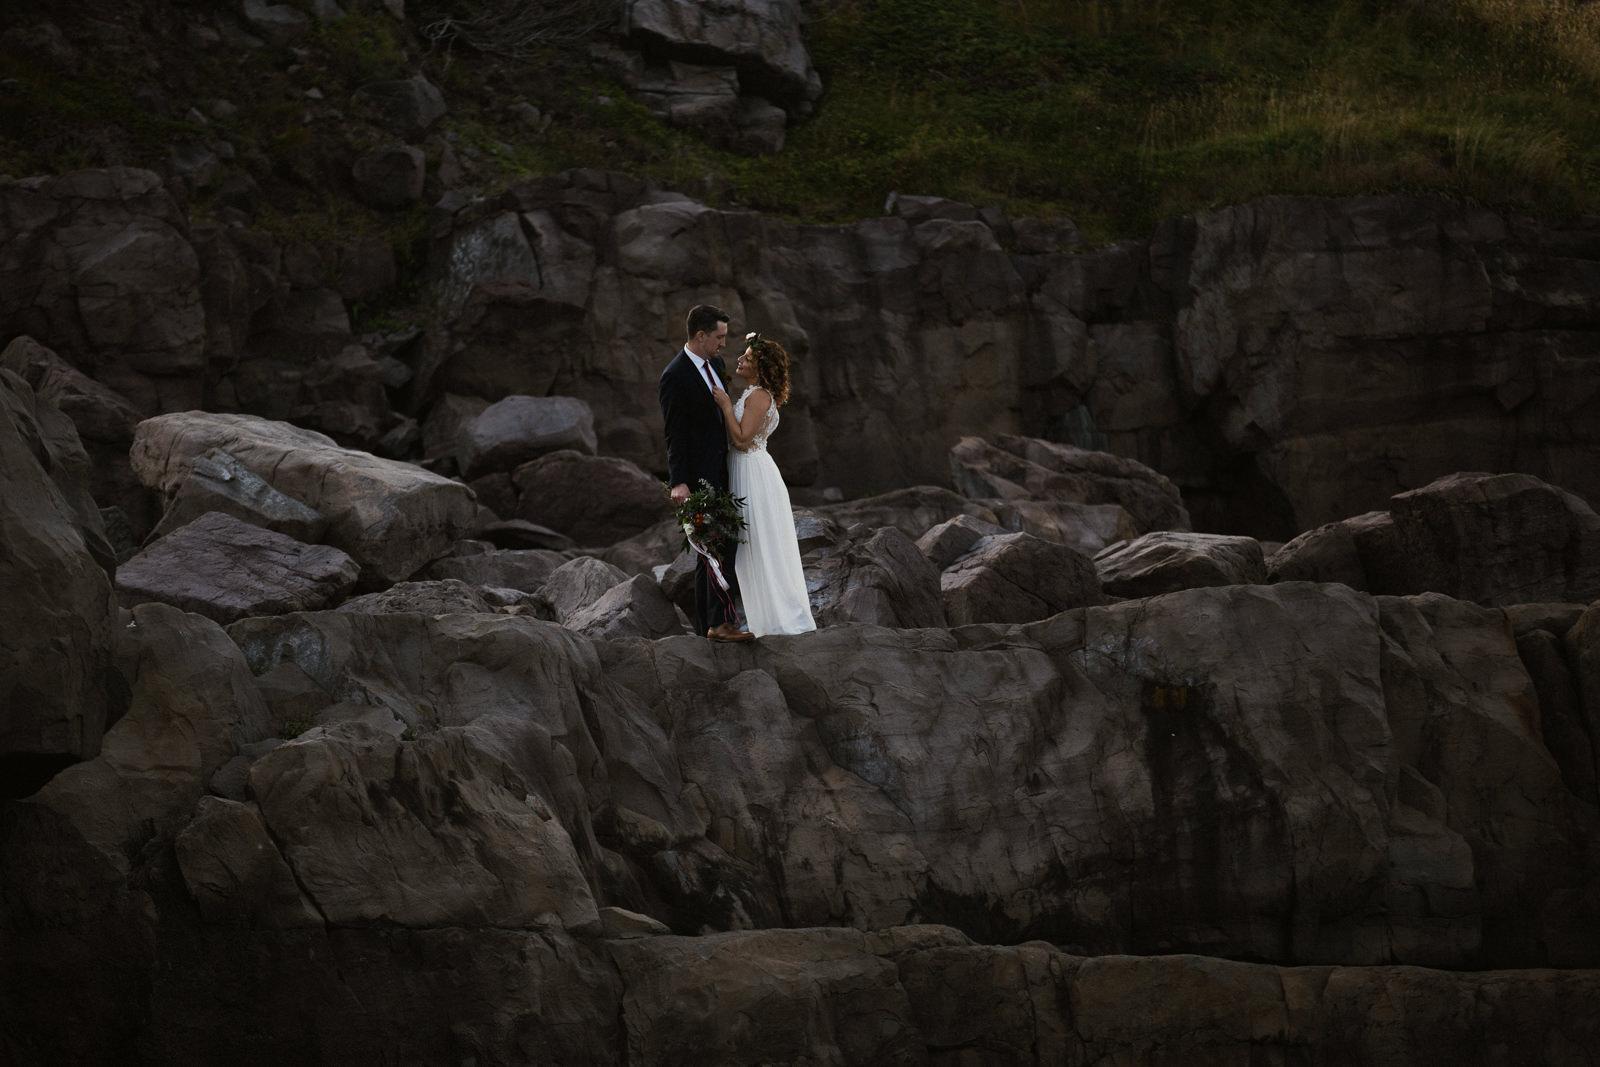 couple on rocks - cape spear newfoundland elopement photographer